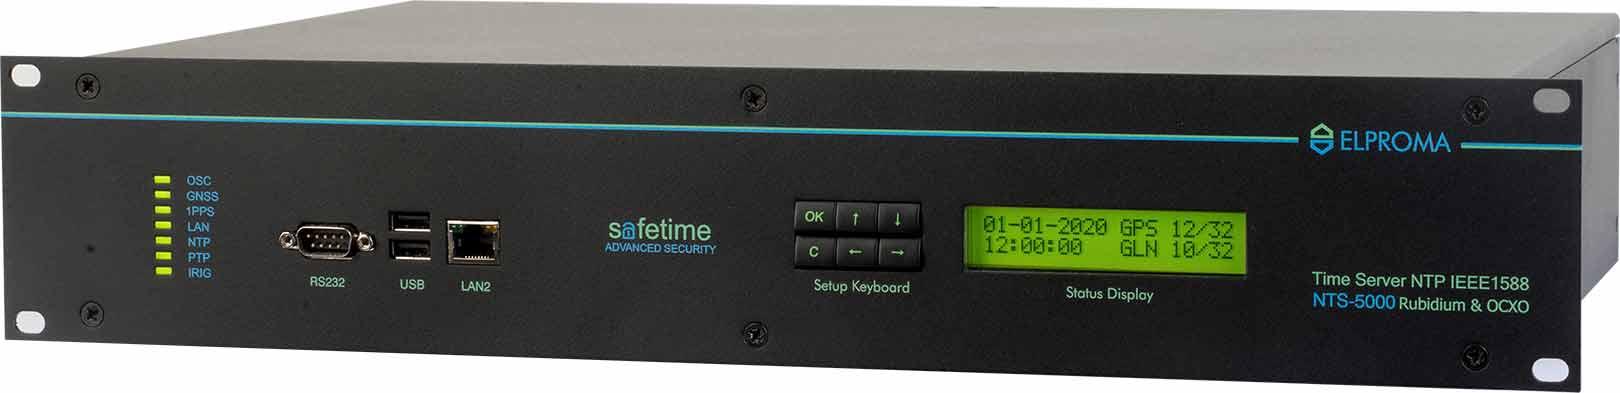 NTS-5000 NTP/PTP IEEE1588 Modular Time Server